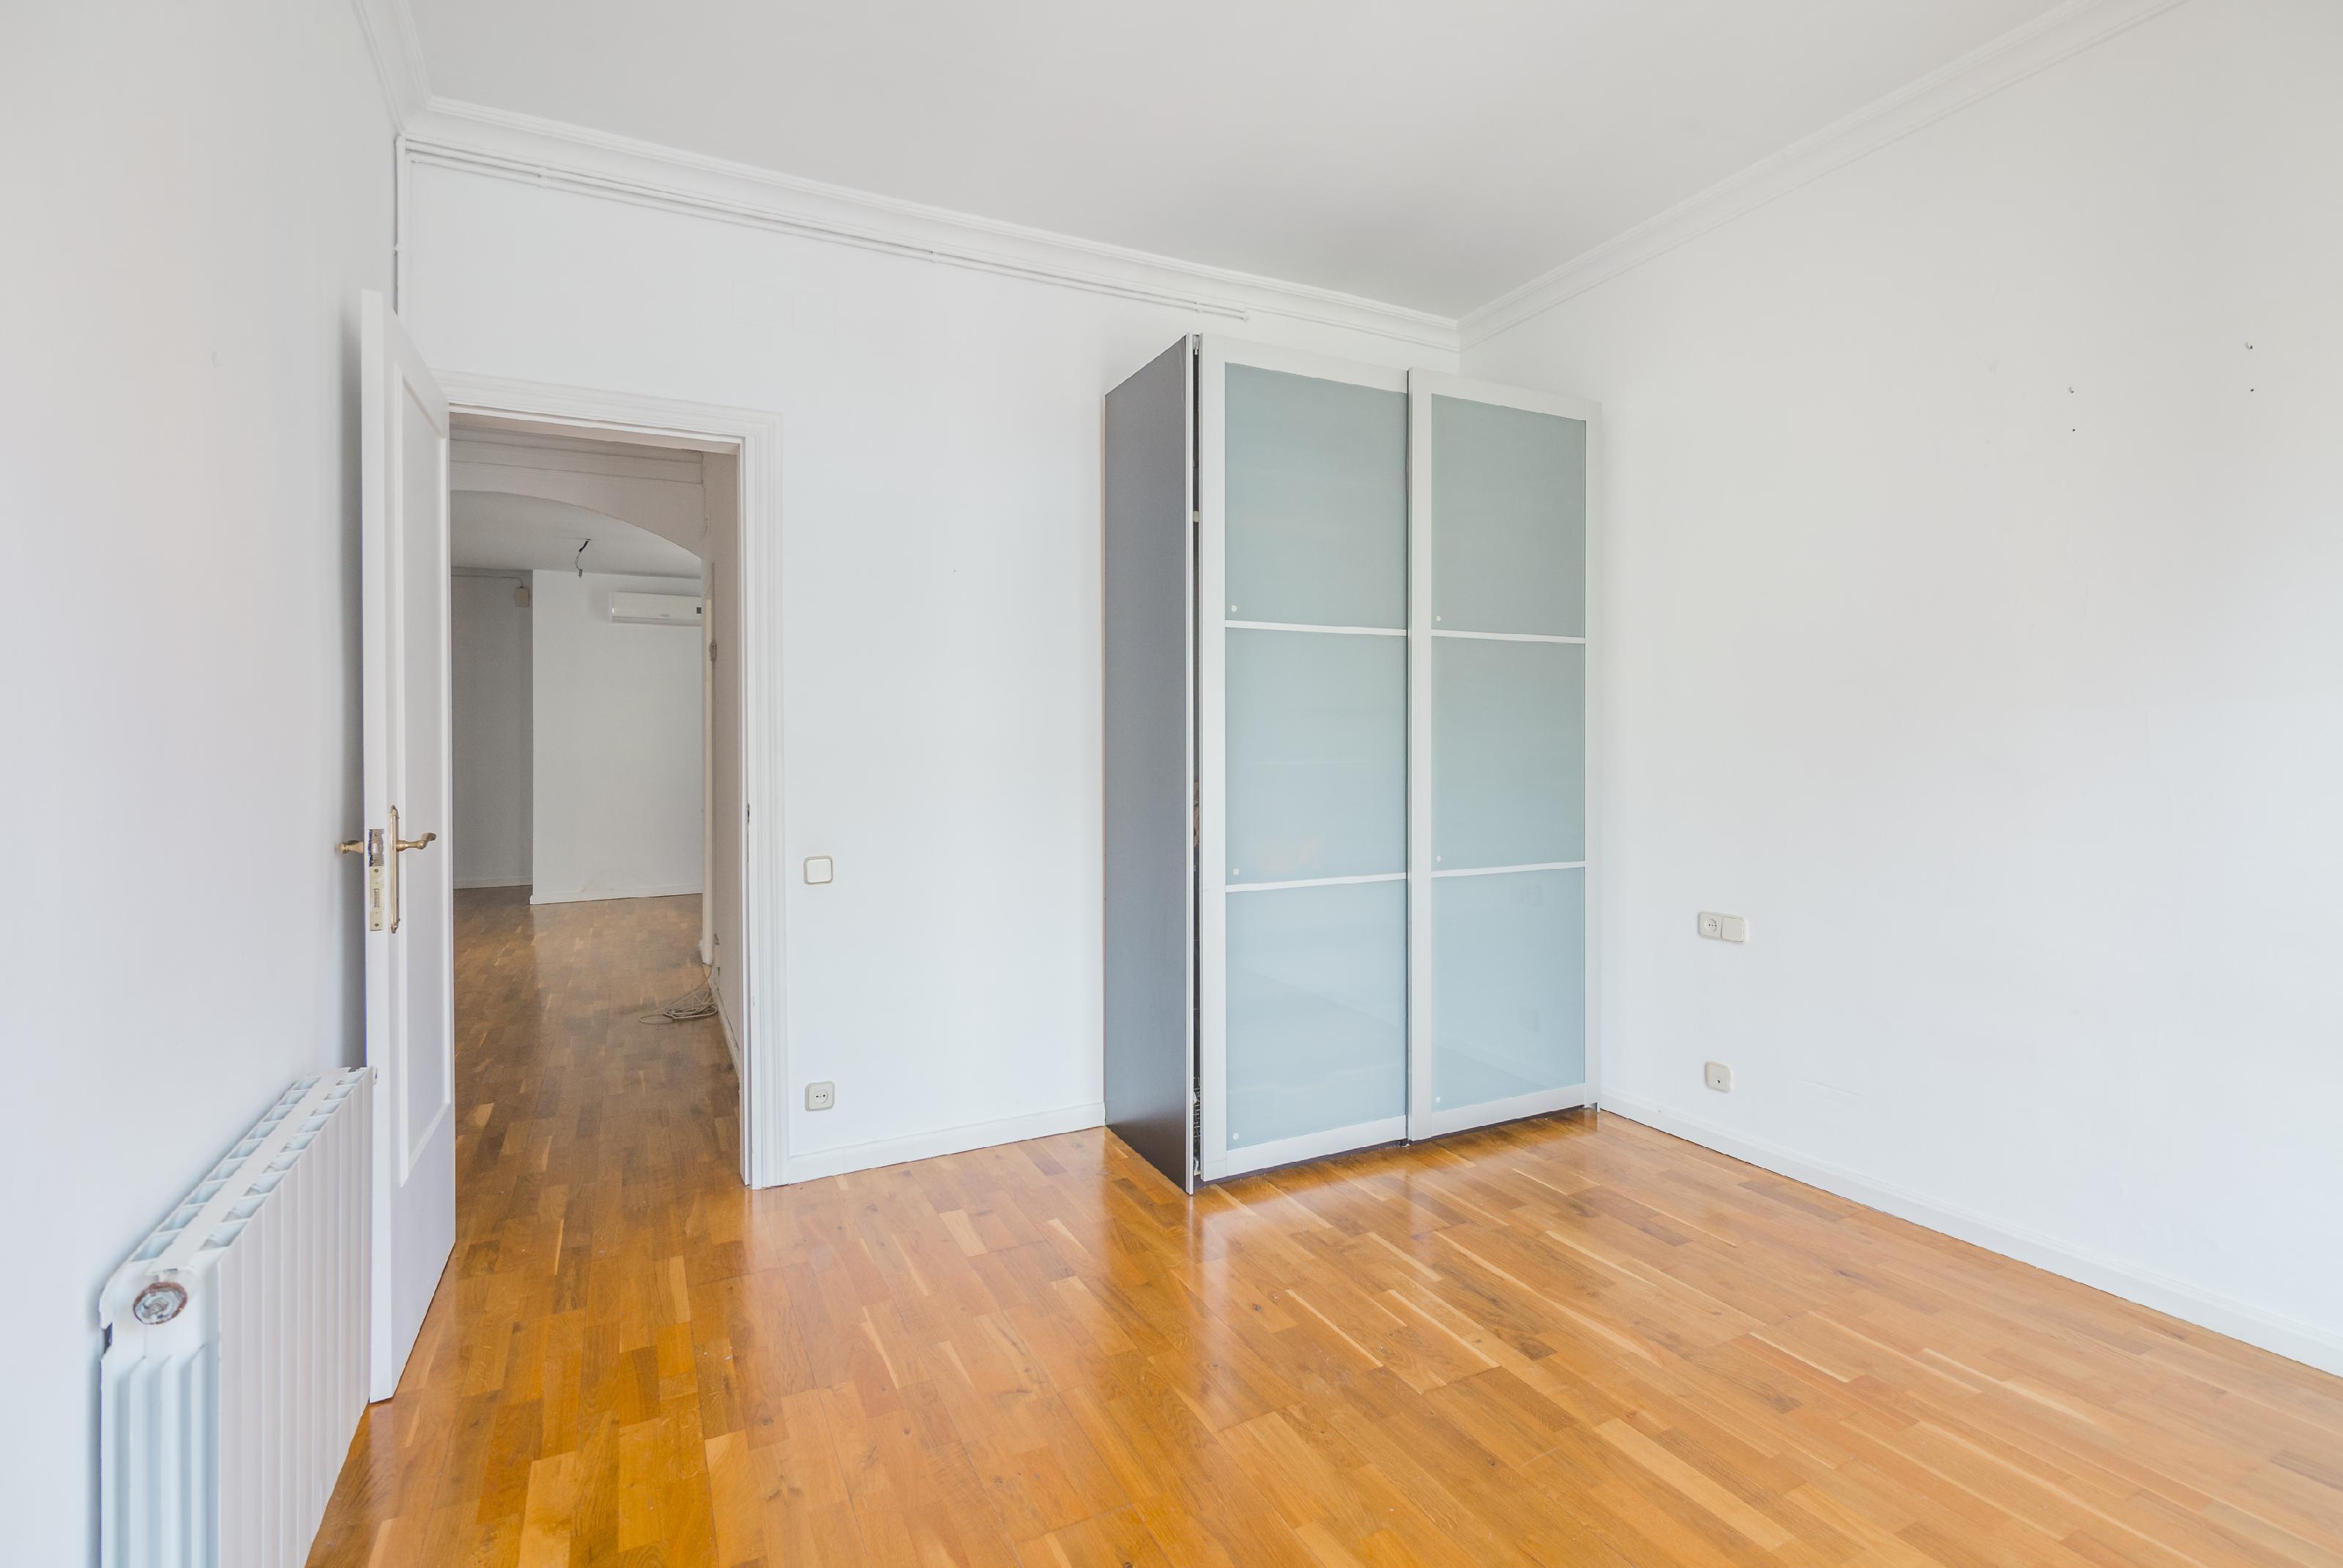 246907 Flat for sale in Eixample, Nova Esquerra Eixample 17